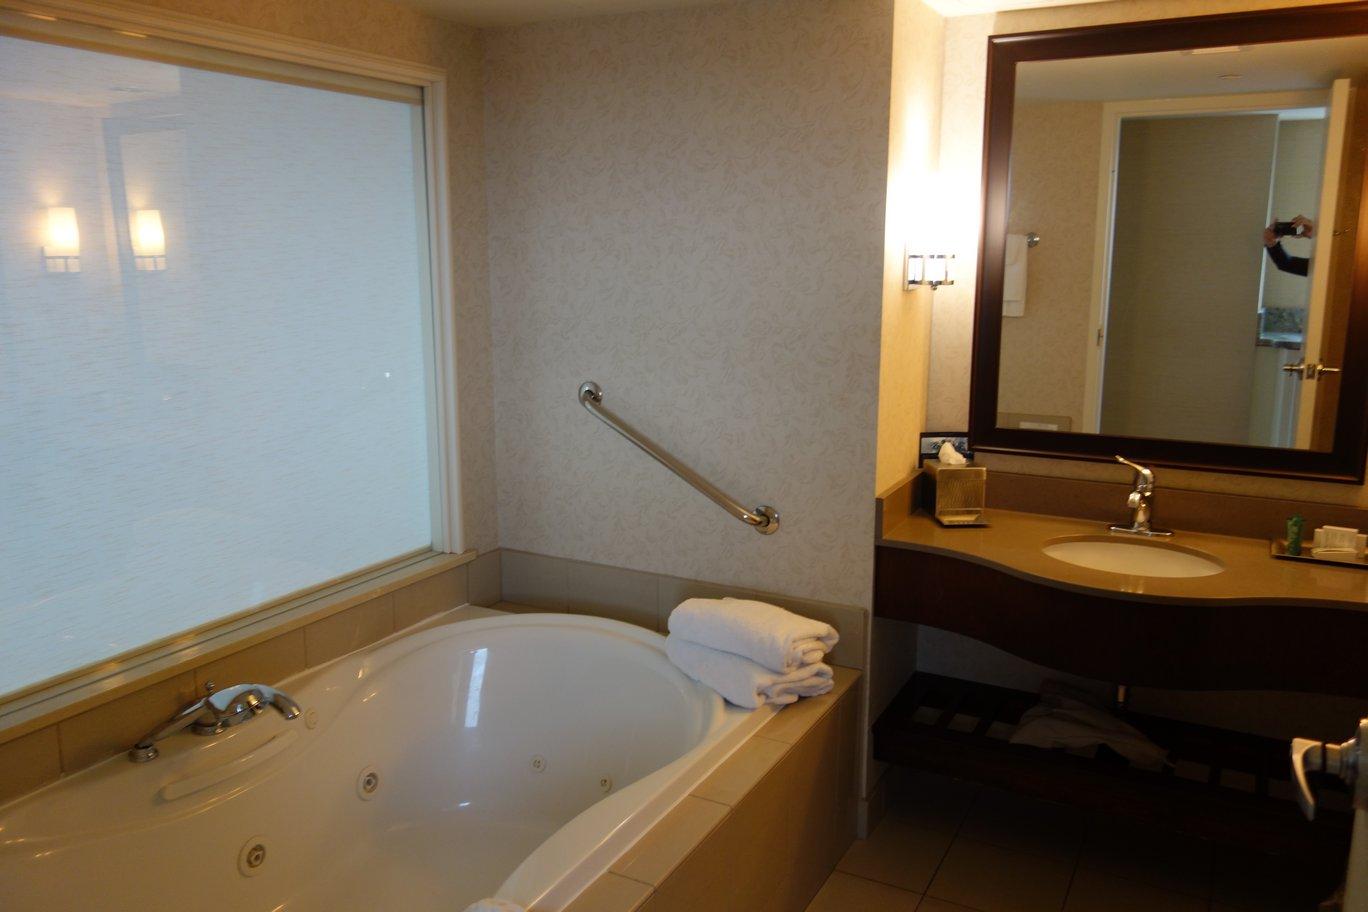 Hilton_Hotel_Niagra_Falls_00006